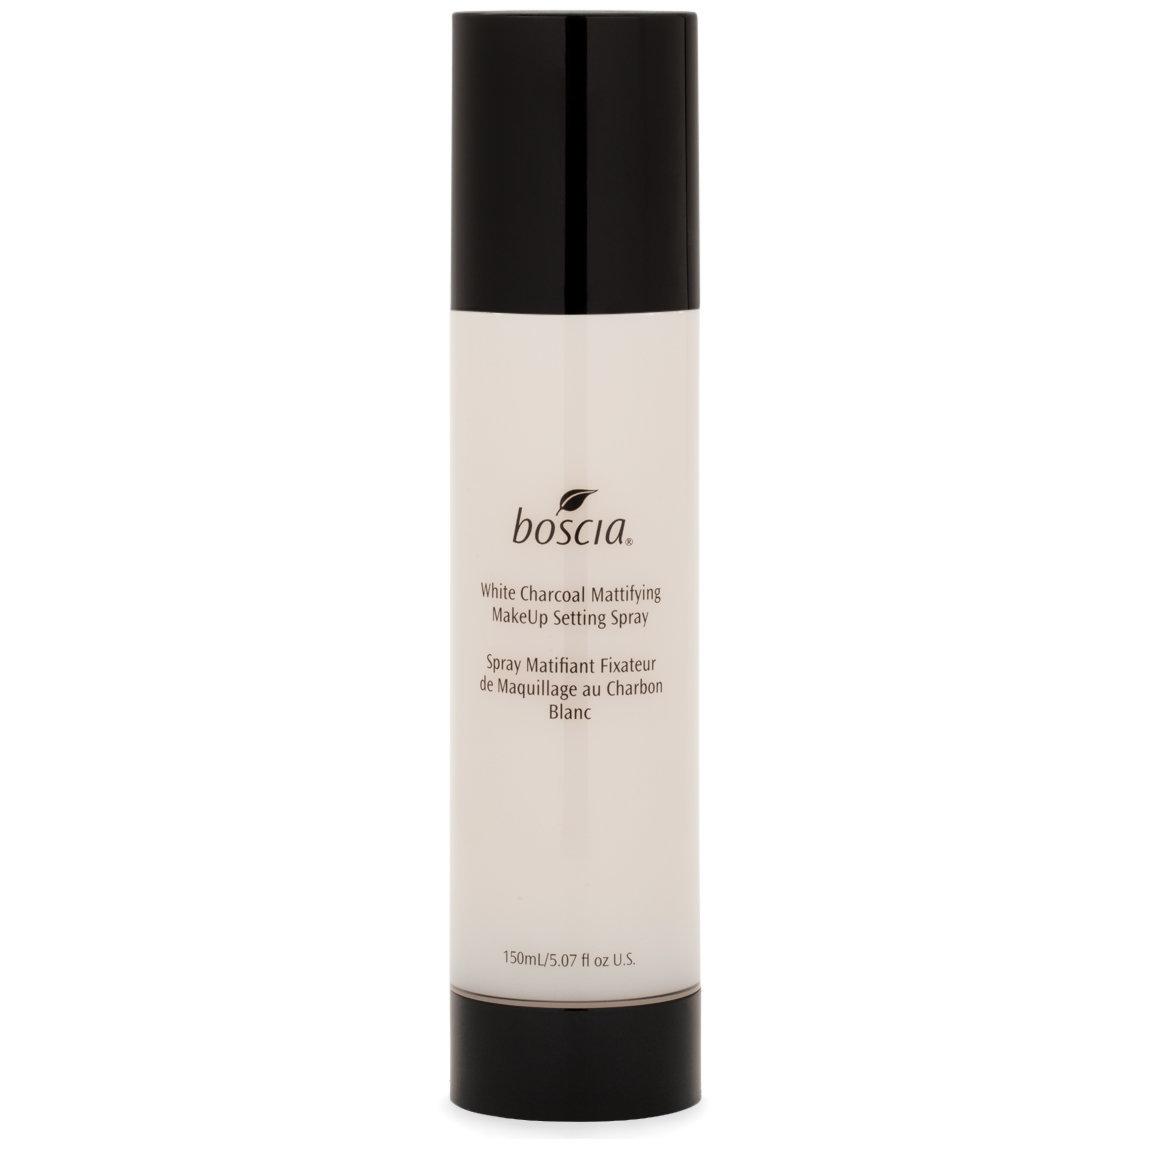 boscia White Charcoal Mattifying Makeup Setting Spray 150 ml product swatch.